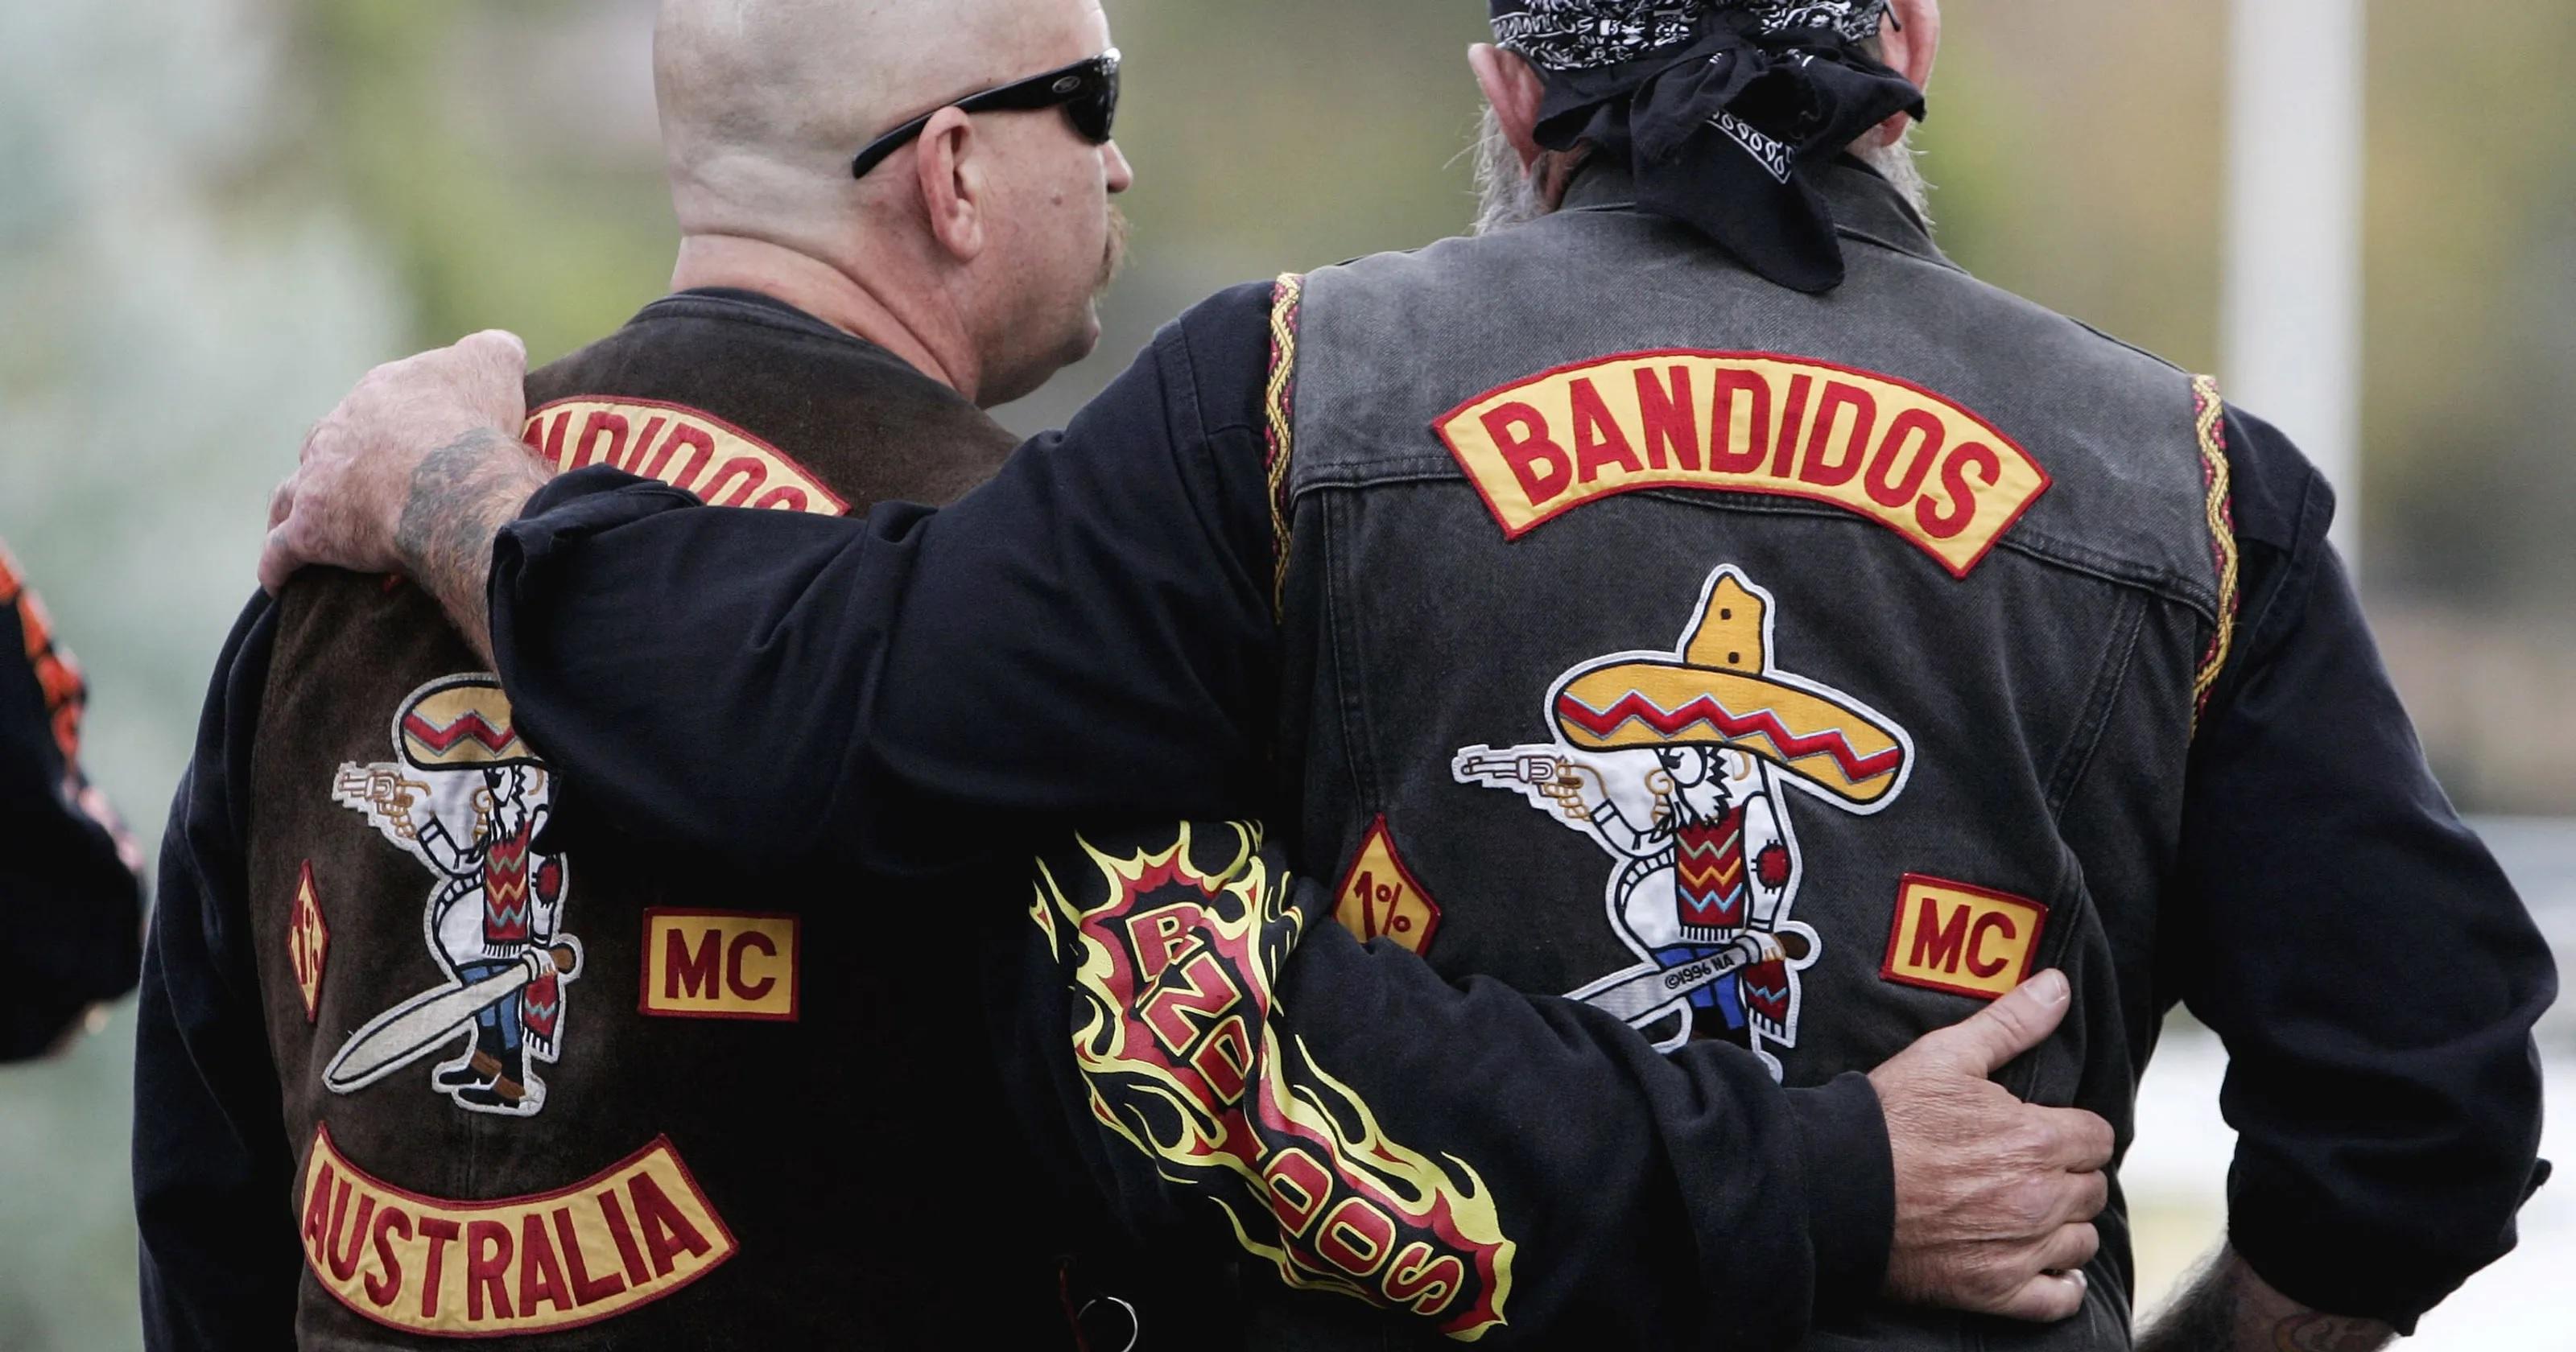 East Bay, California - Buffalo Soldiers Motorcycle Club |Motorcycle Gang Member Names